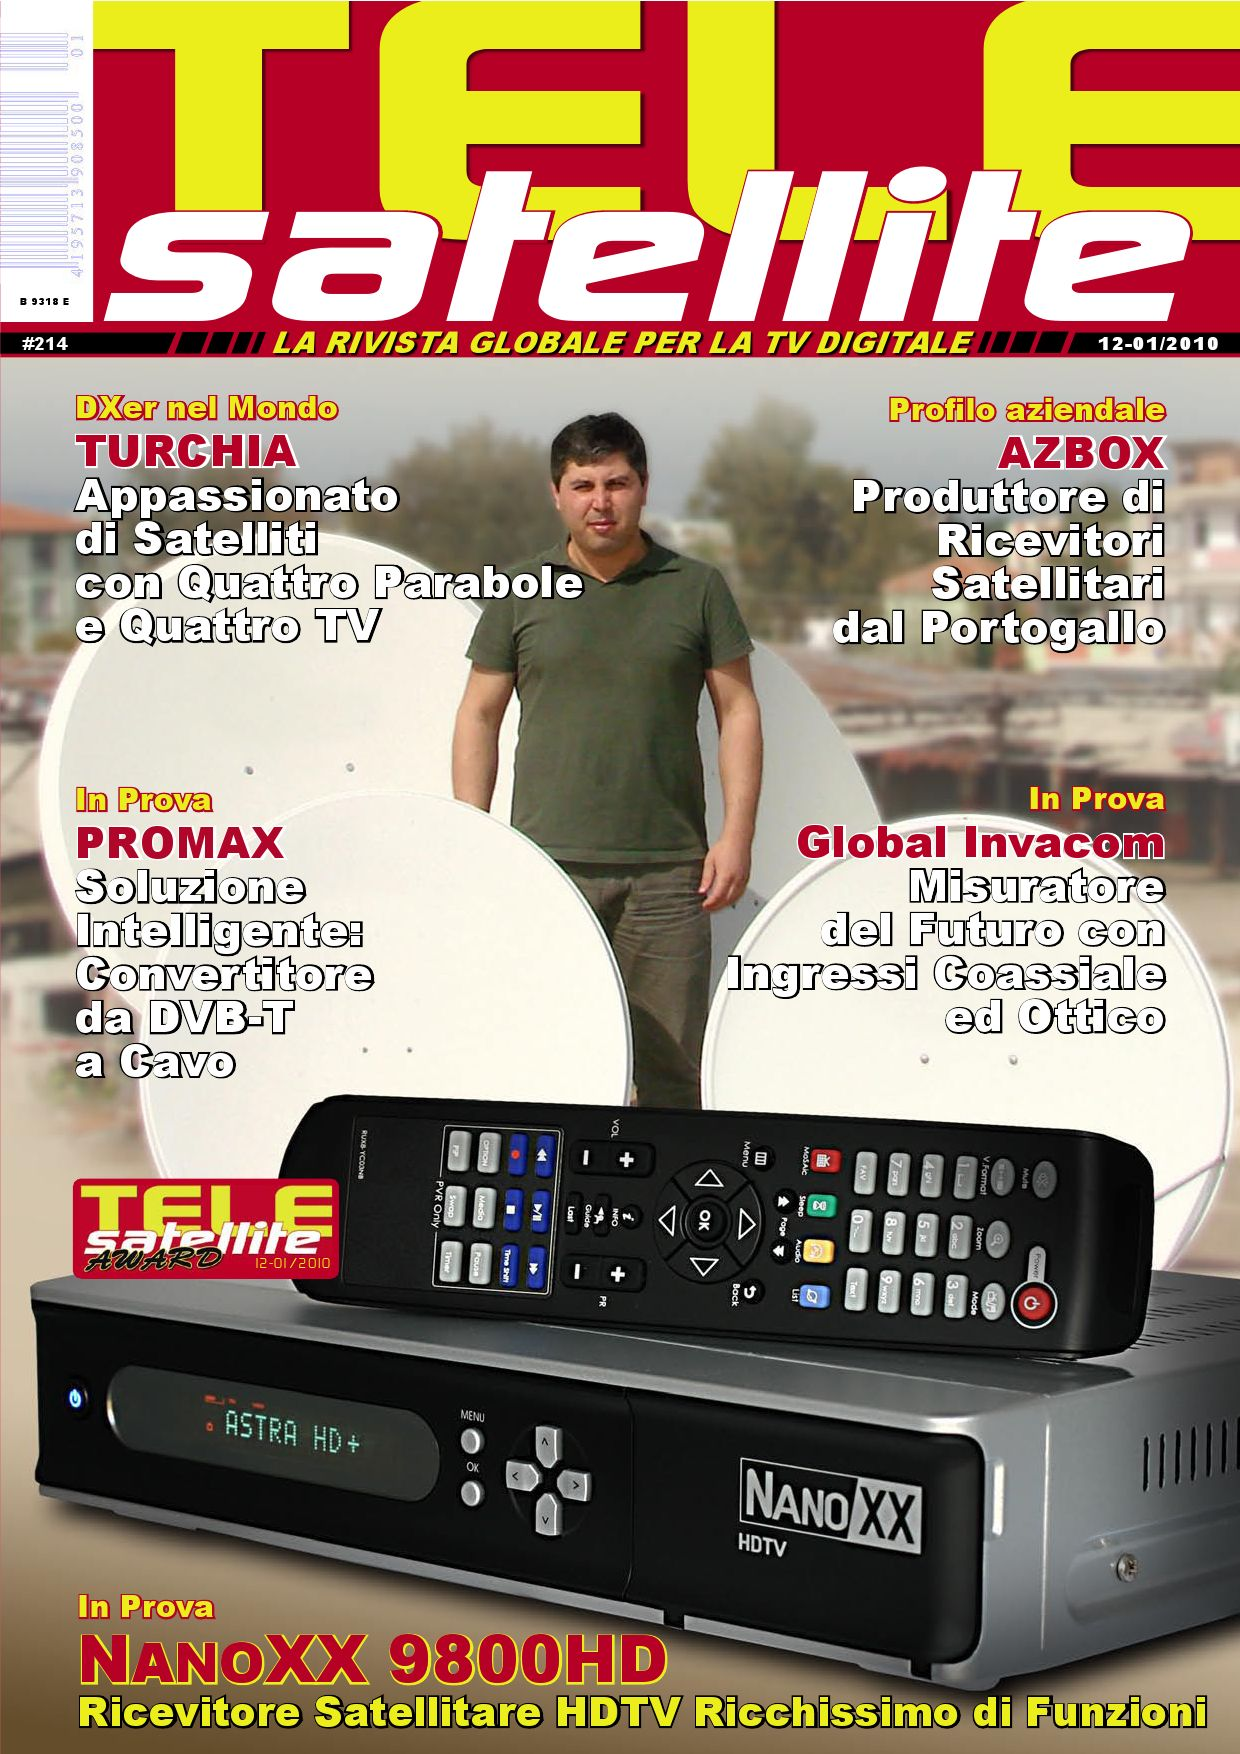 ita TELE-satellite 1001 by Alexander Wiese - issuu 321bdea05f8